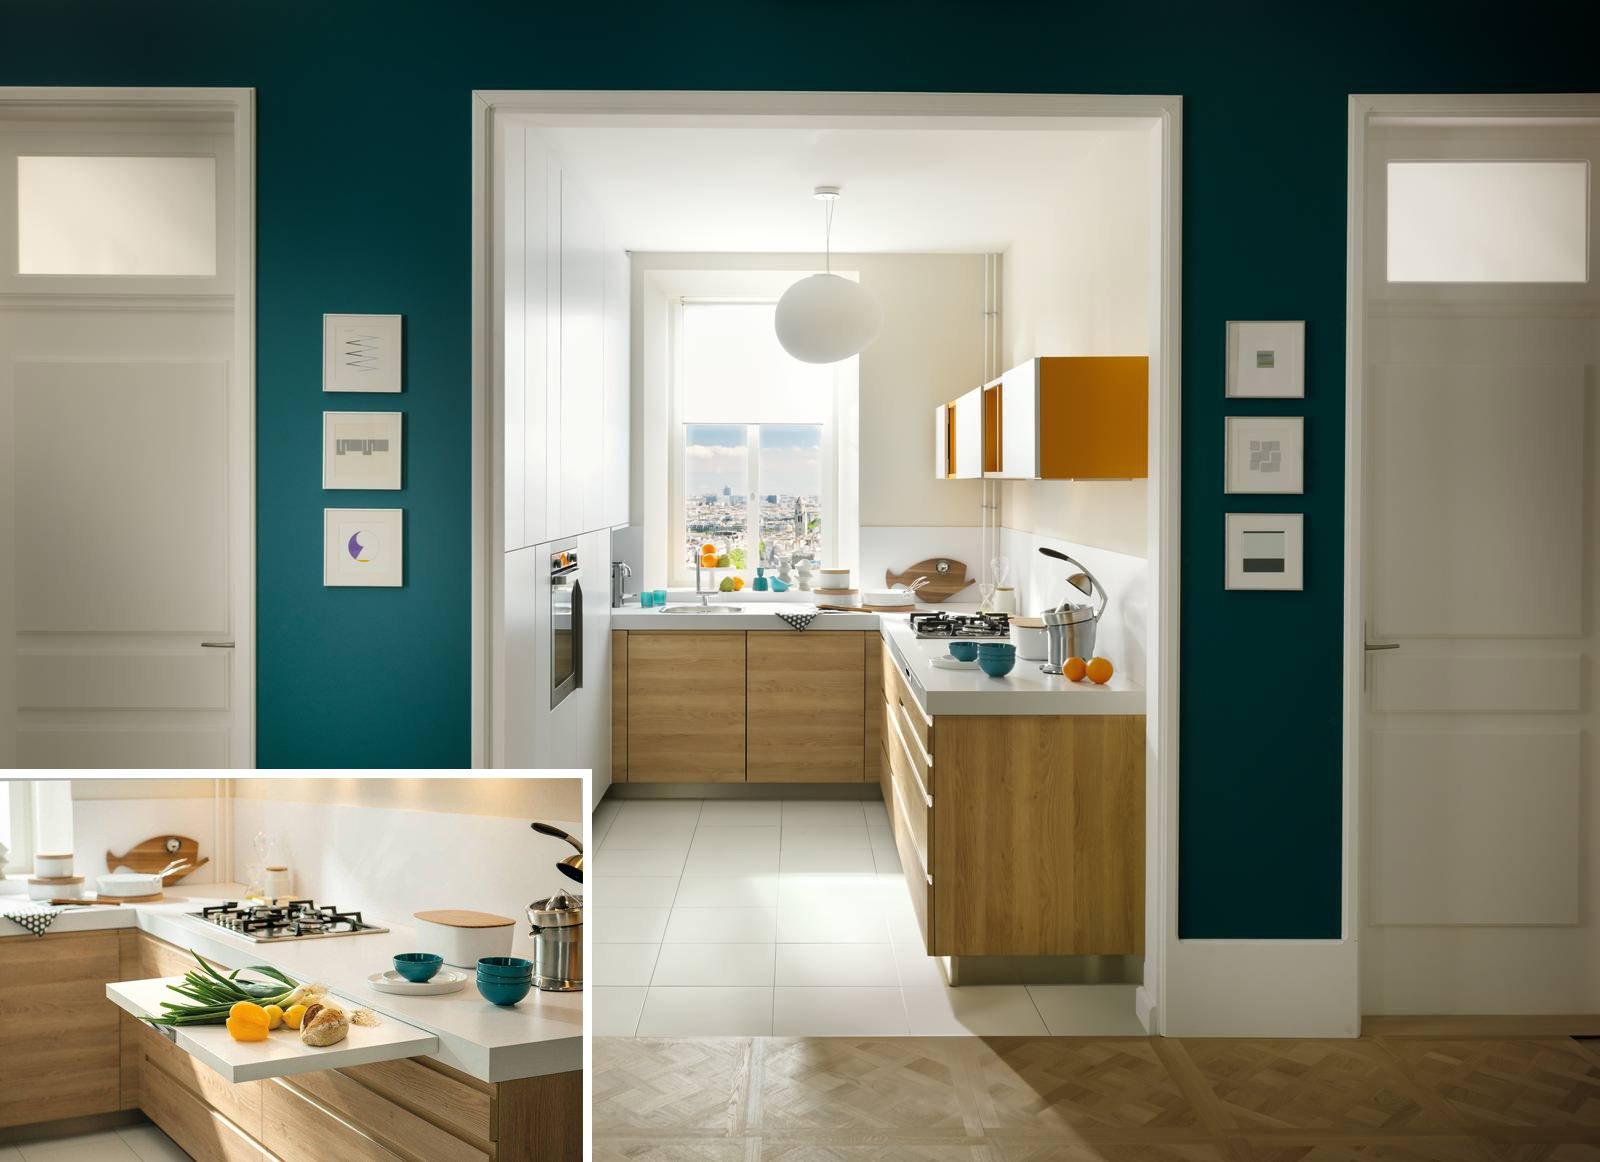 Mini cucina 5 soluzioni per la cucina piccola cose di casa - Colori per cucina piccola ...